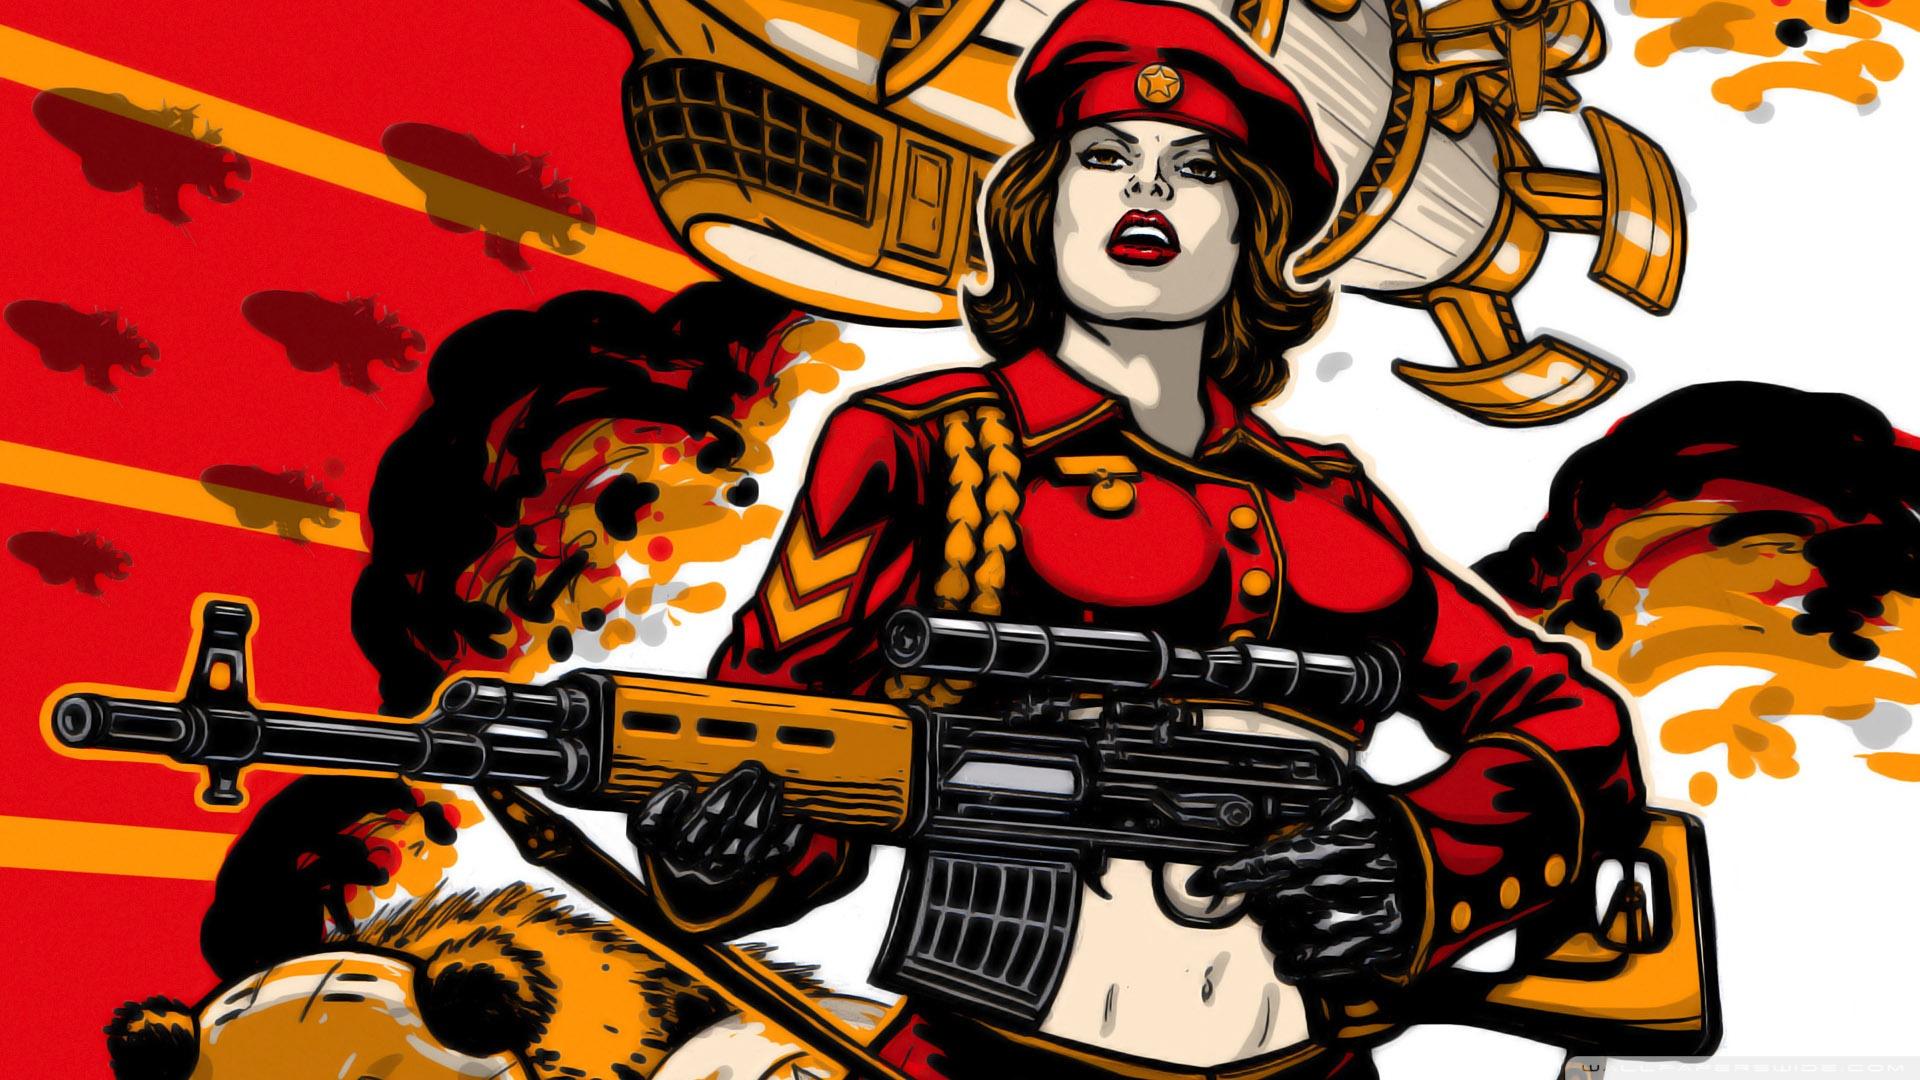 Red Alert 3 Soviet Army Girl Wallpaper | WallpaperLists.COM